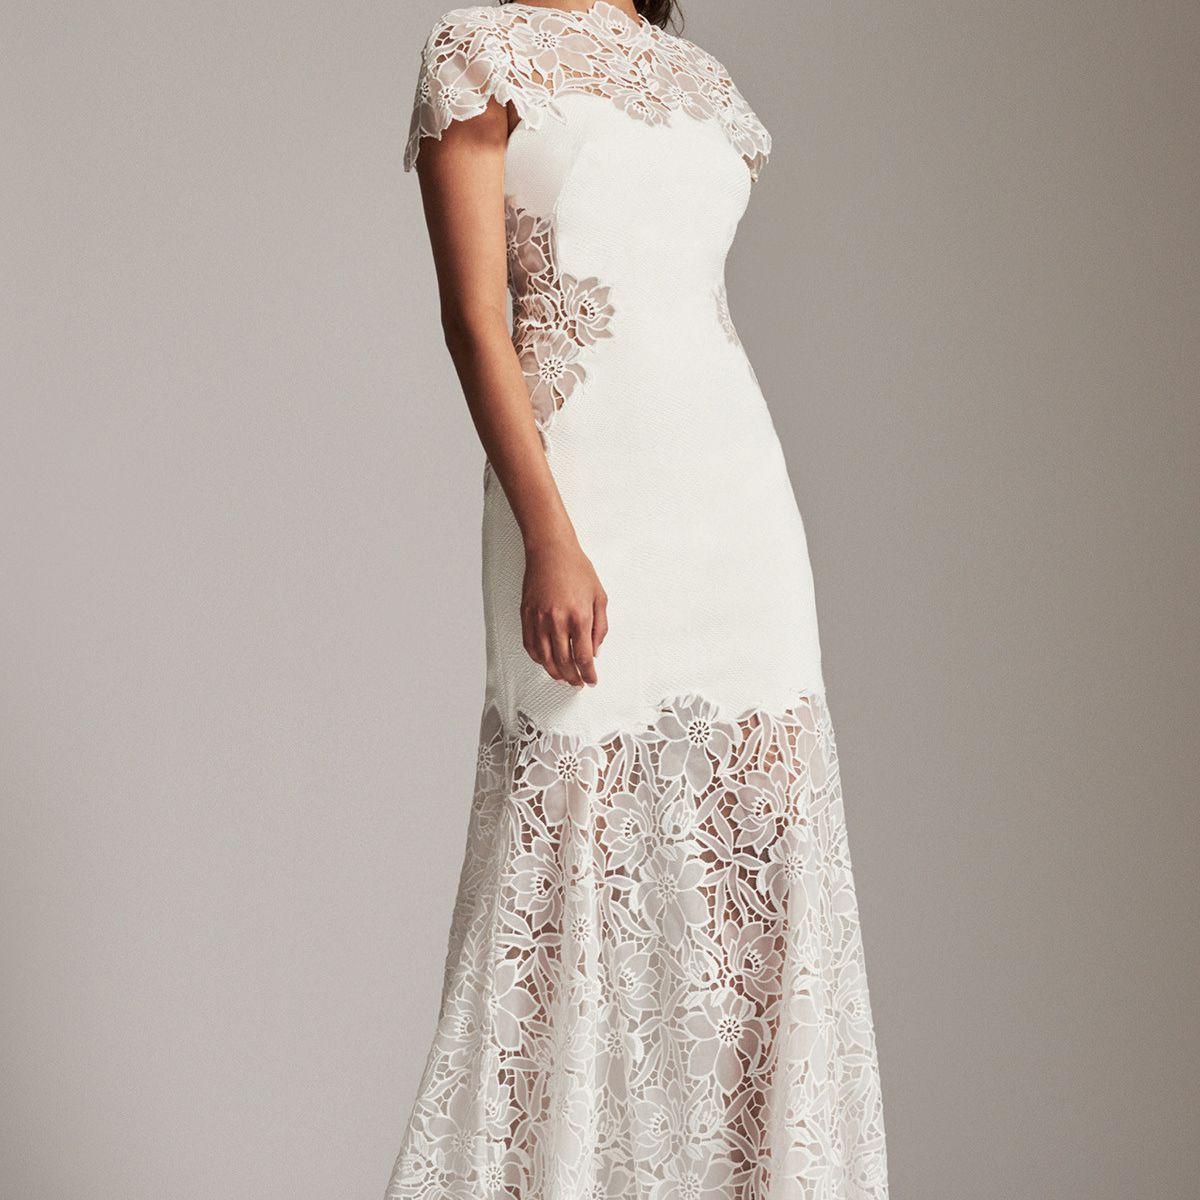 Model in illusion mermaid wedding gown